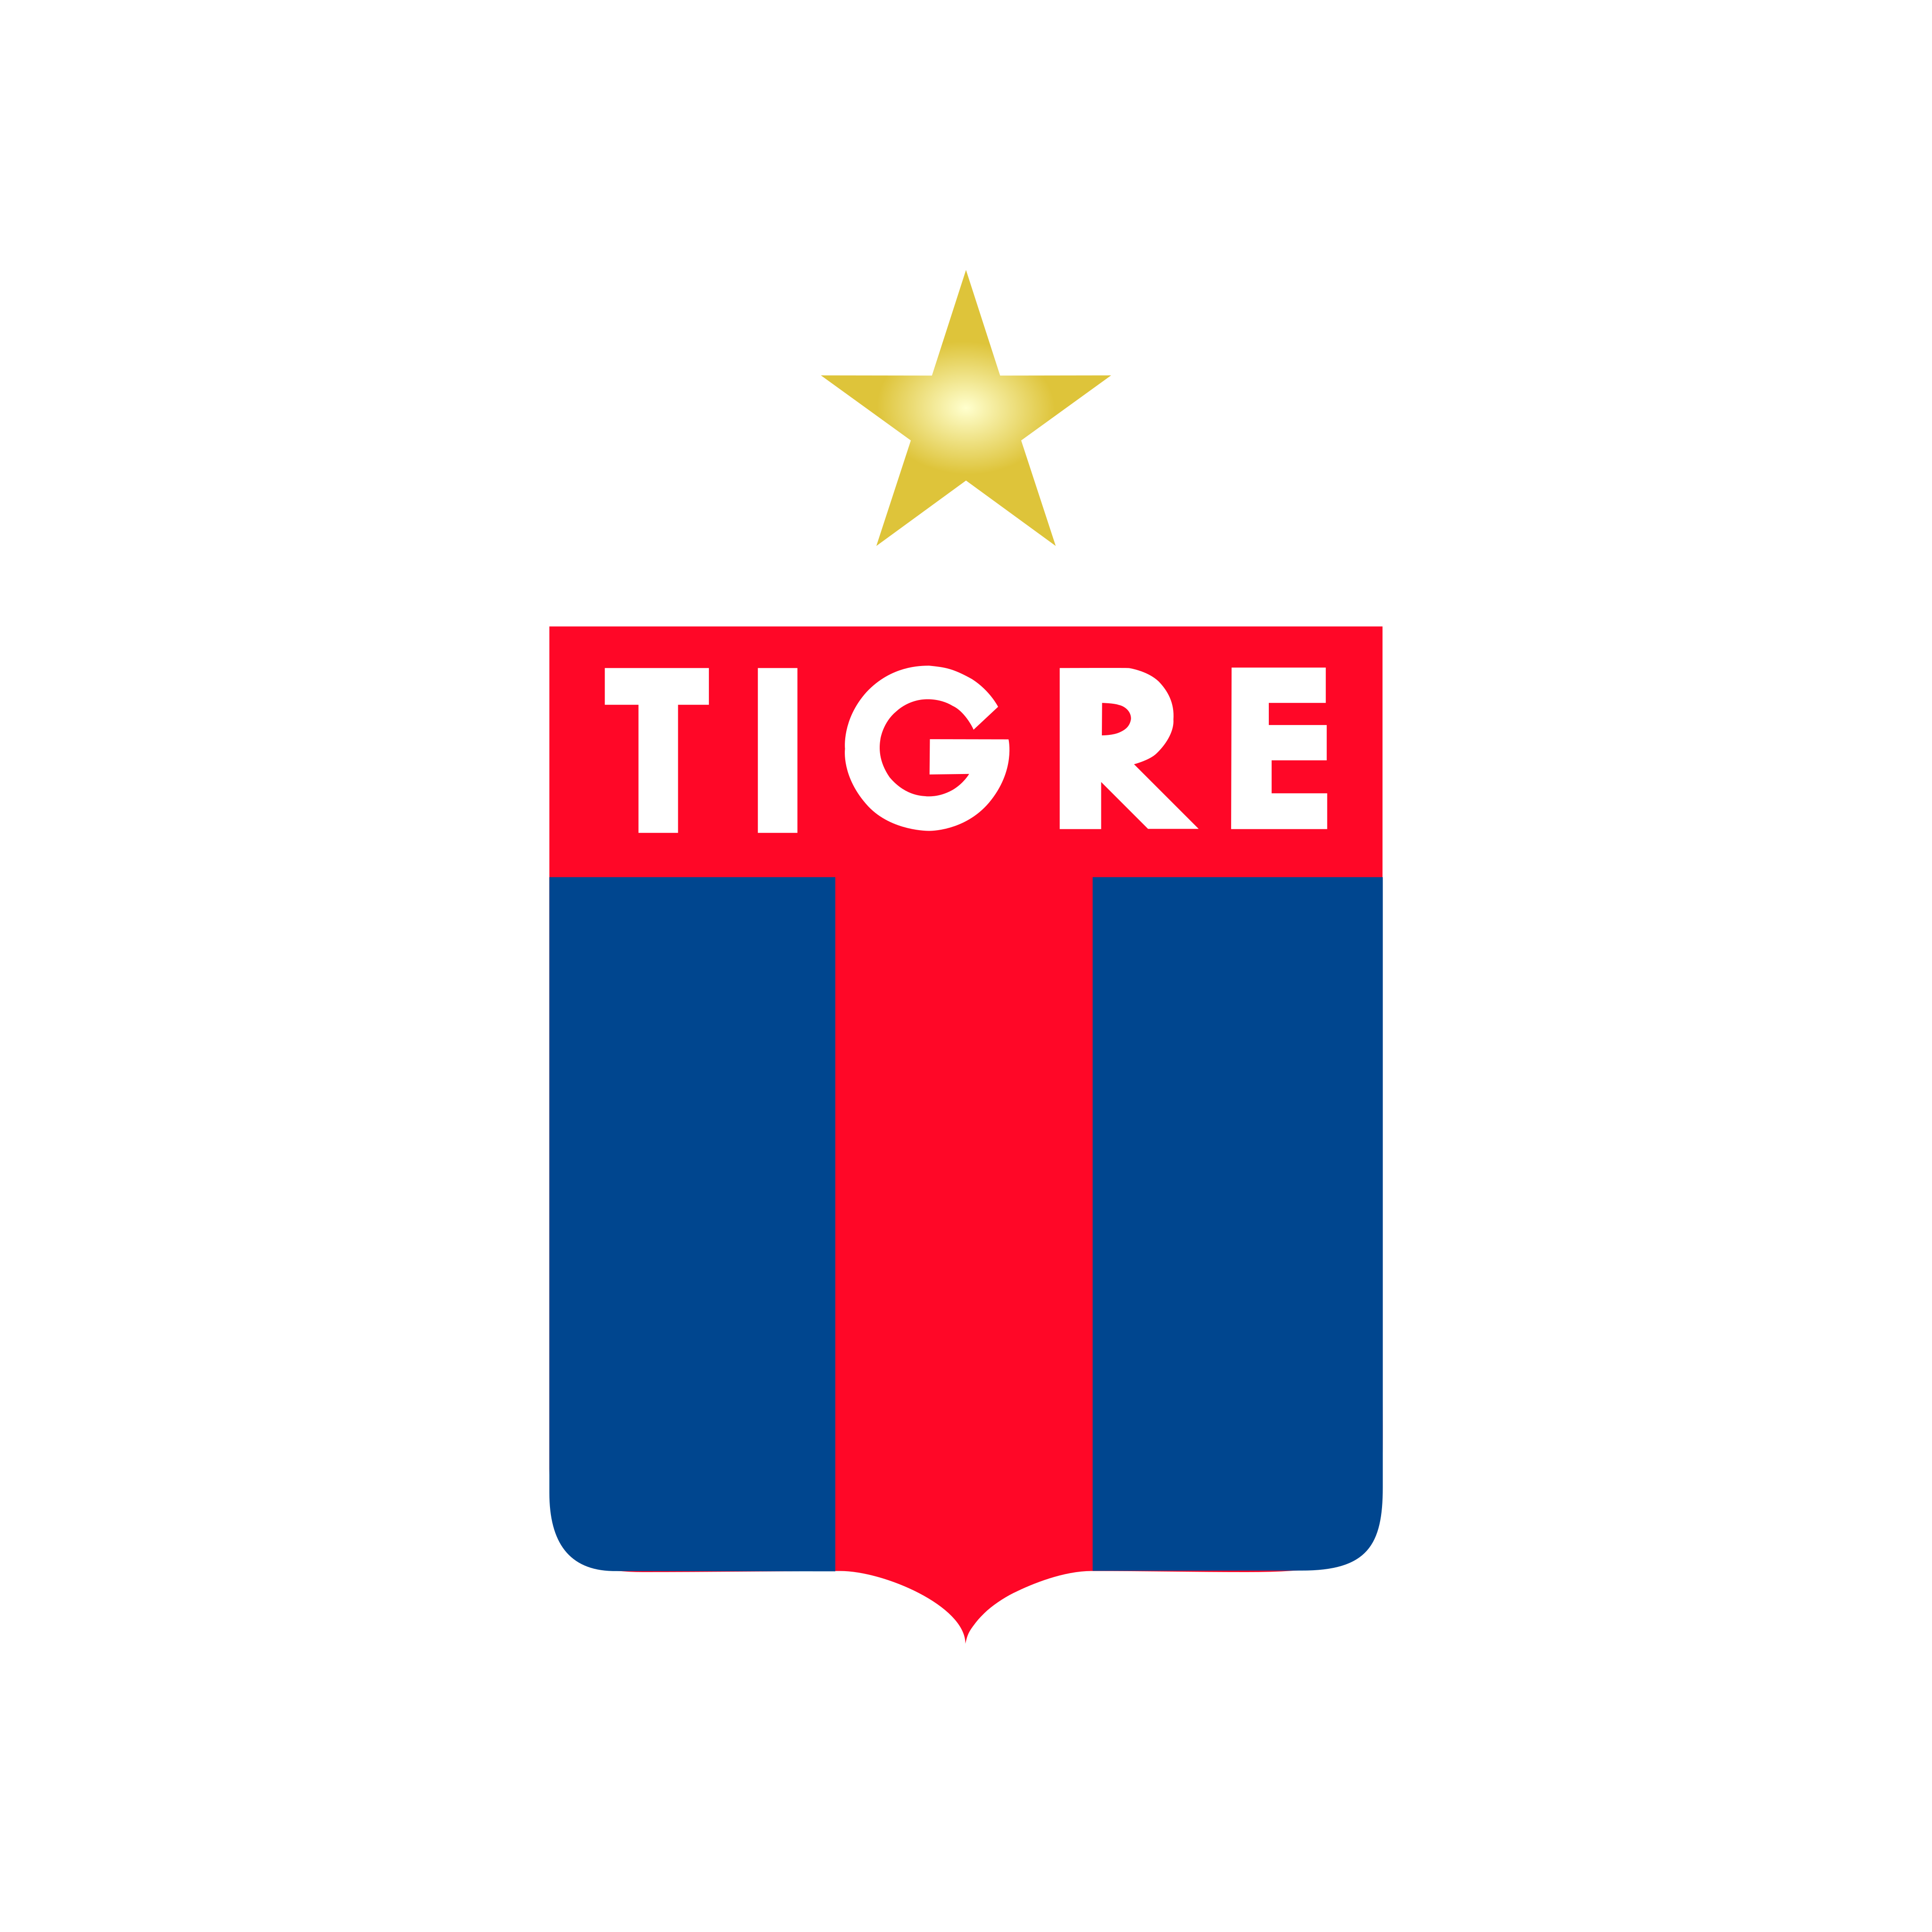 tigre-logo-argentina-0